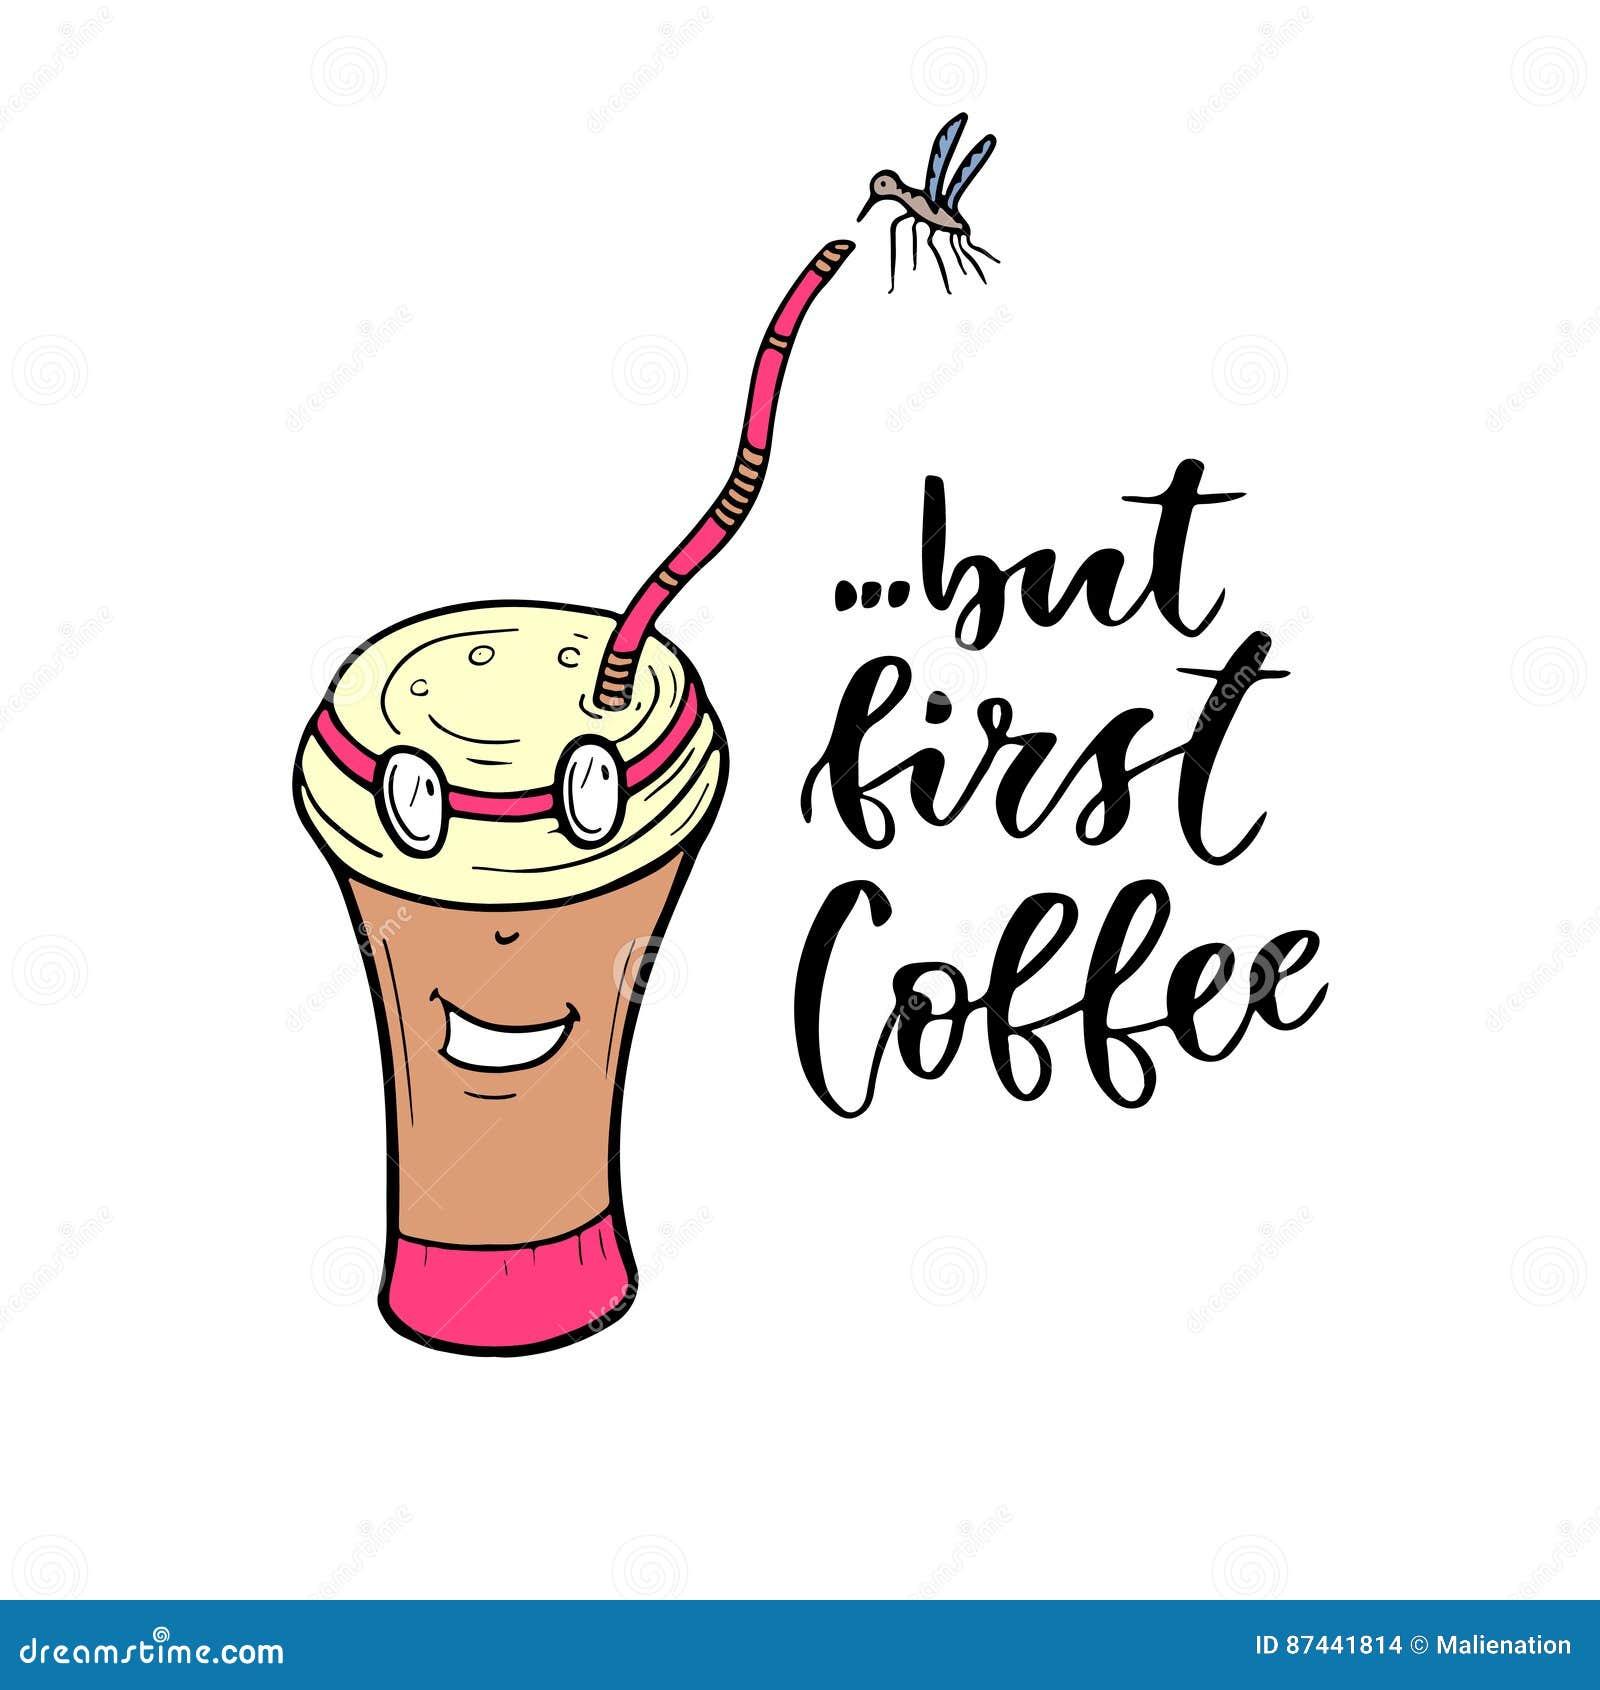 image relating to Printable Coffee Mugs identify Cartoon Identity Espresso Mug. Impressive Vector Lettering - Still